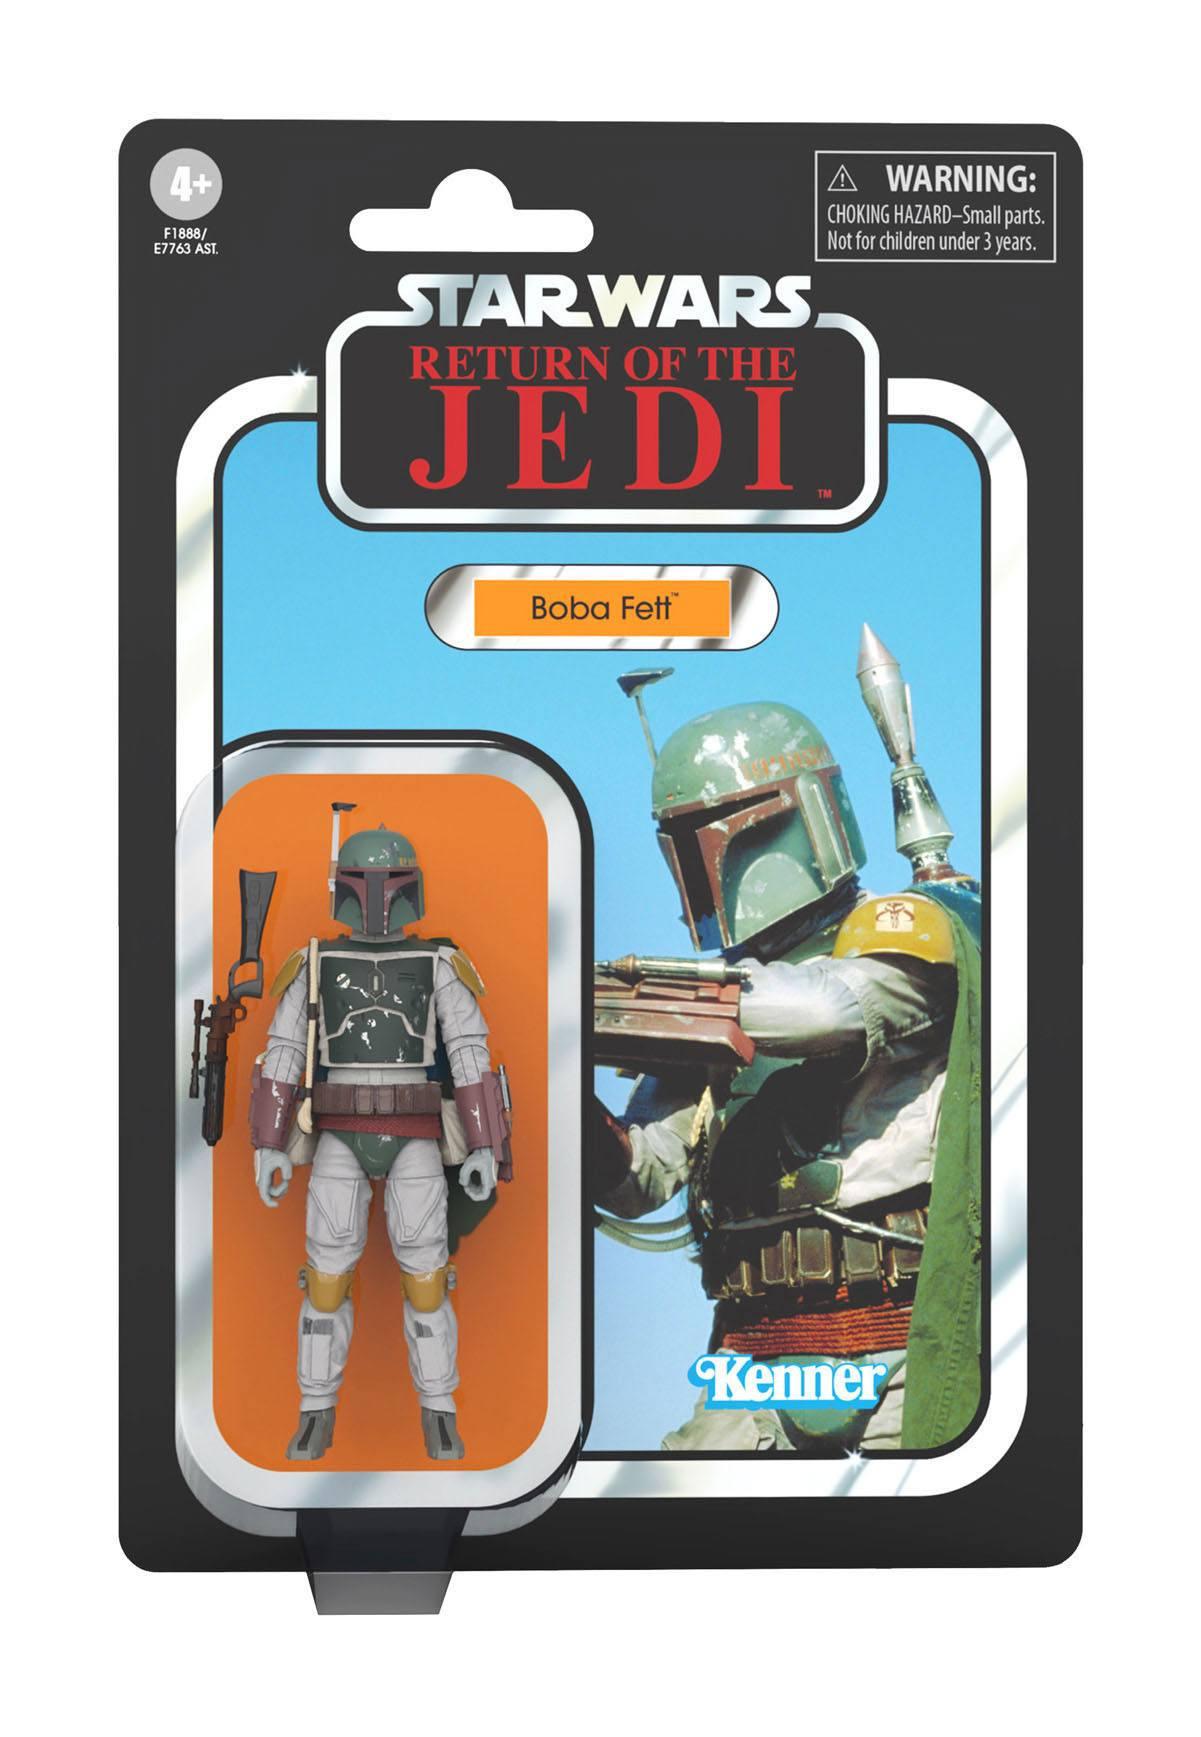 2. Version mit geändertem Brustpanzer Star Wars The Vintage Collection Boba Fett ROTJ F18885L00